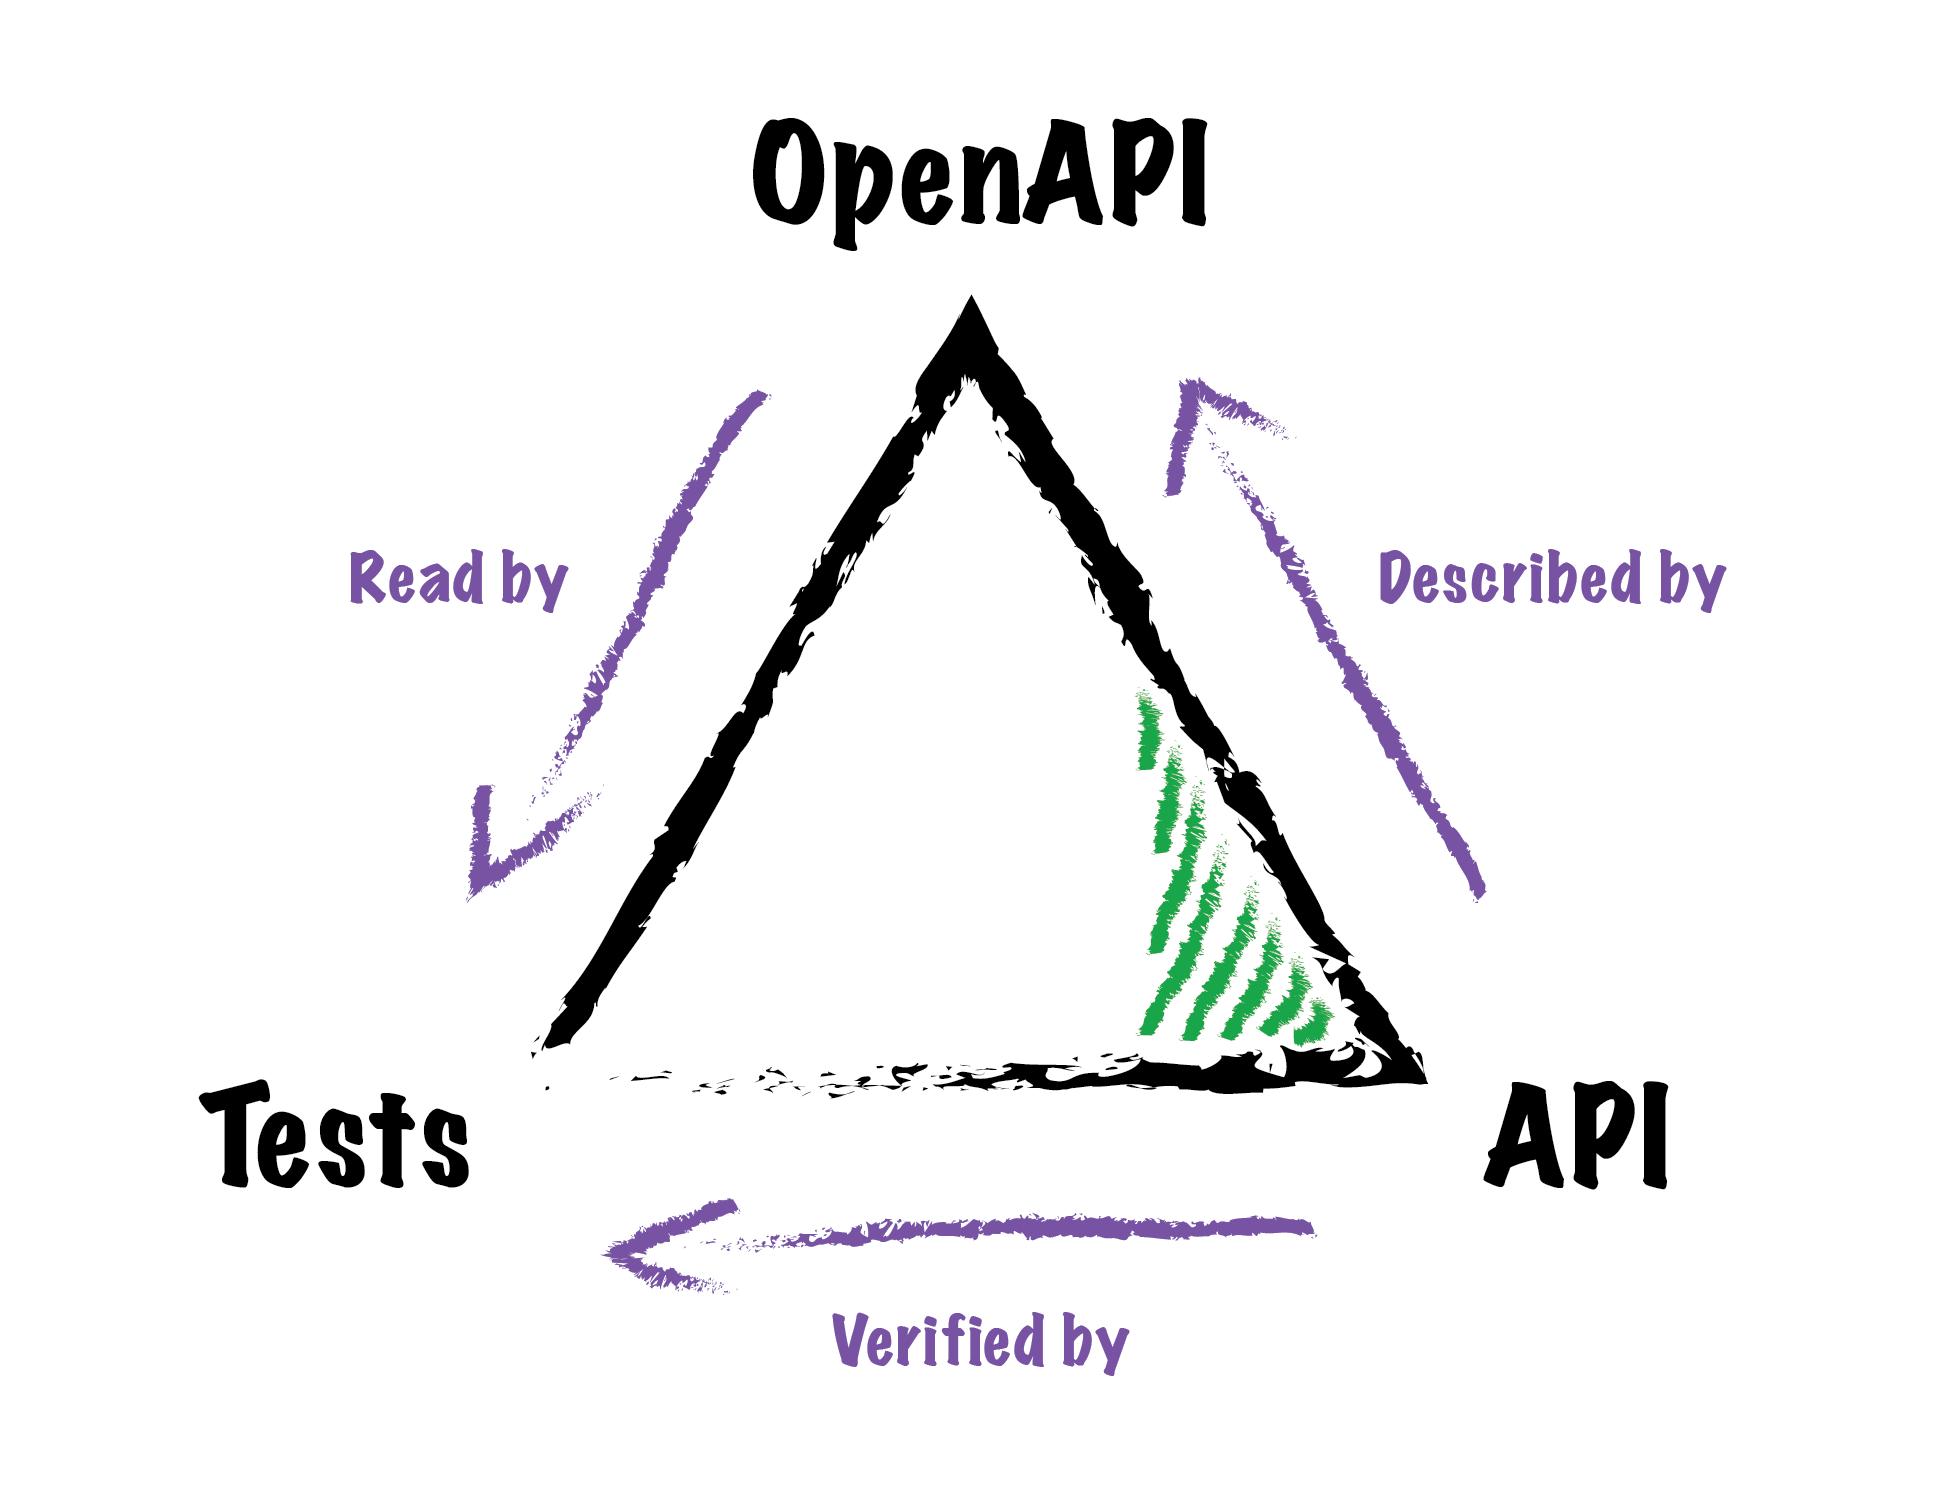 OpenAPI, API and tests relationship